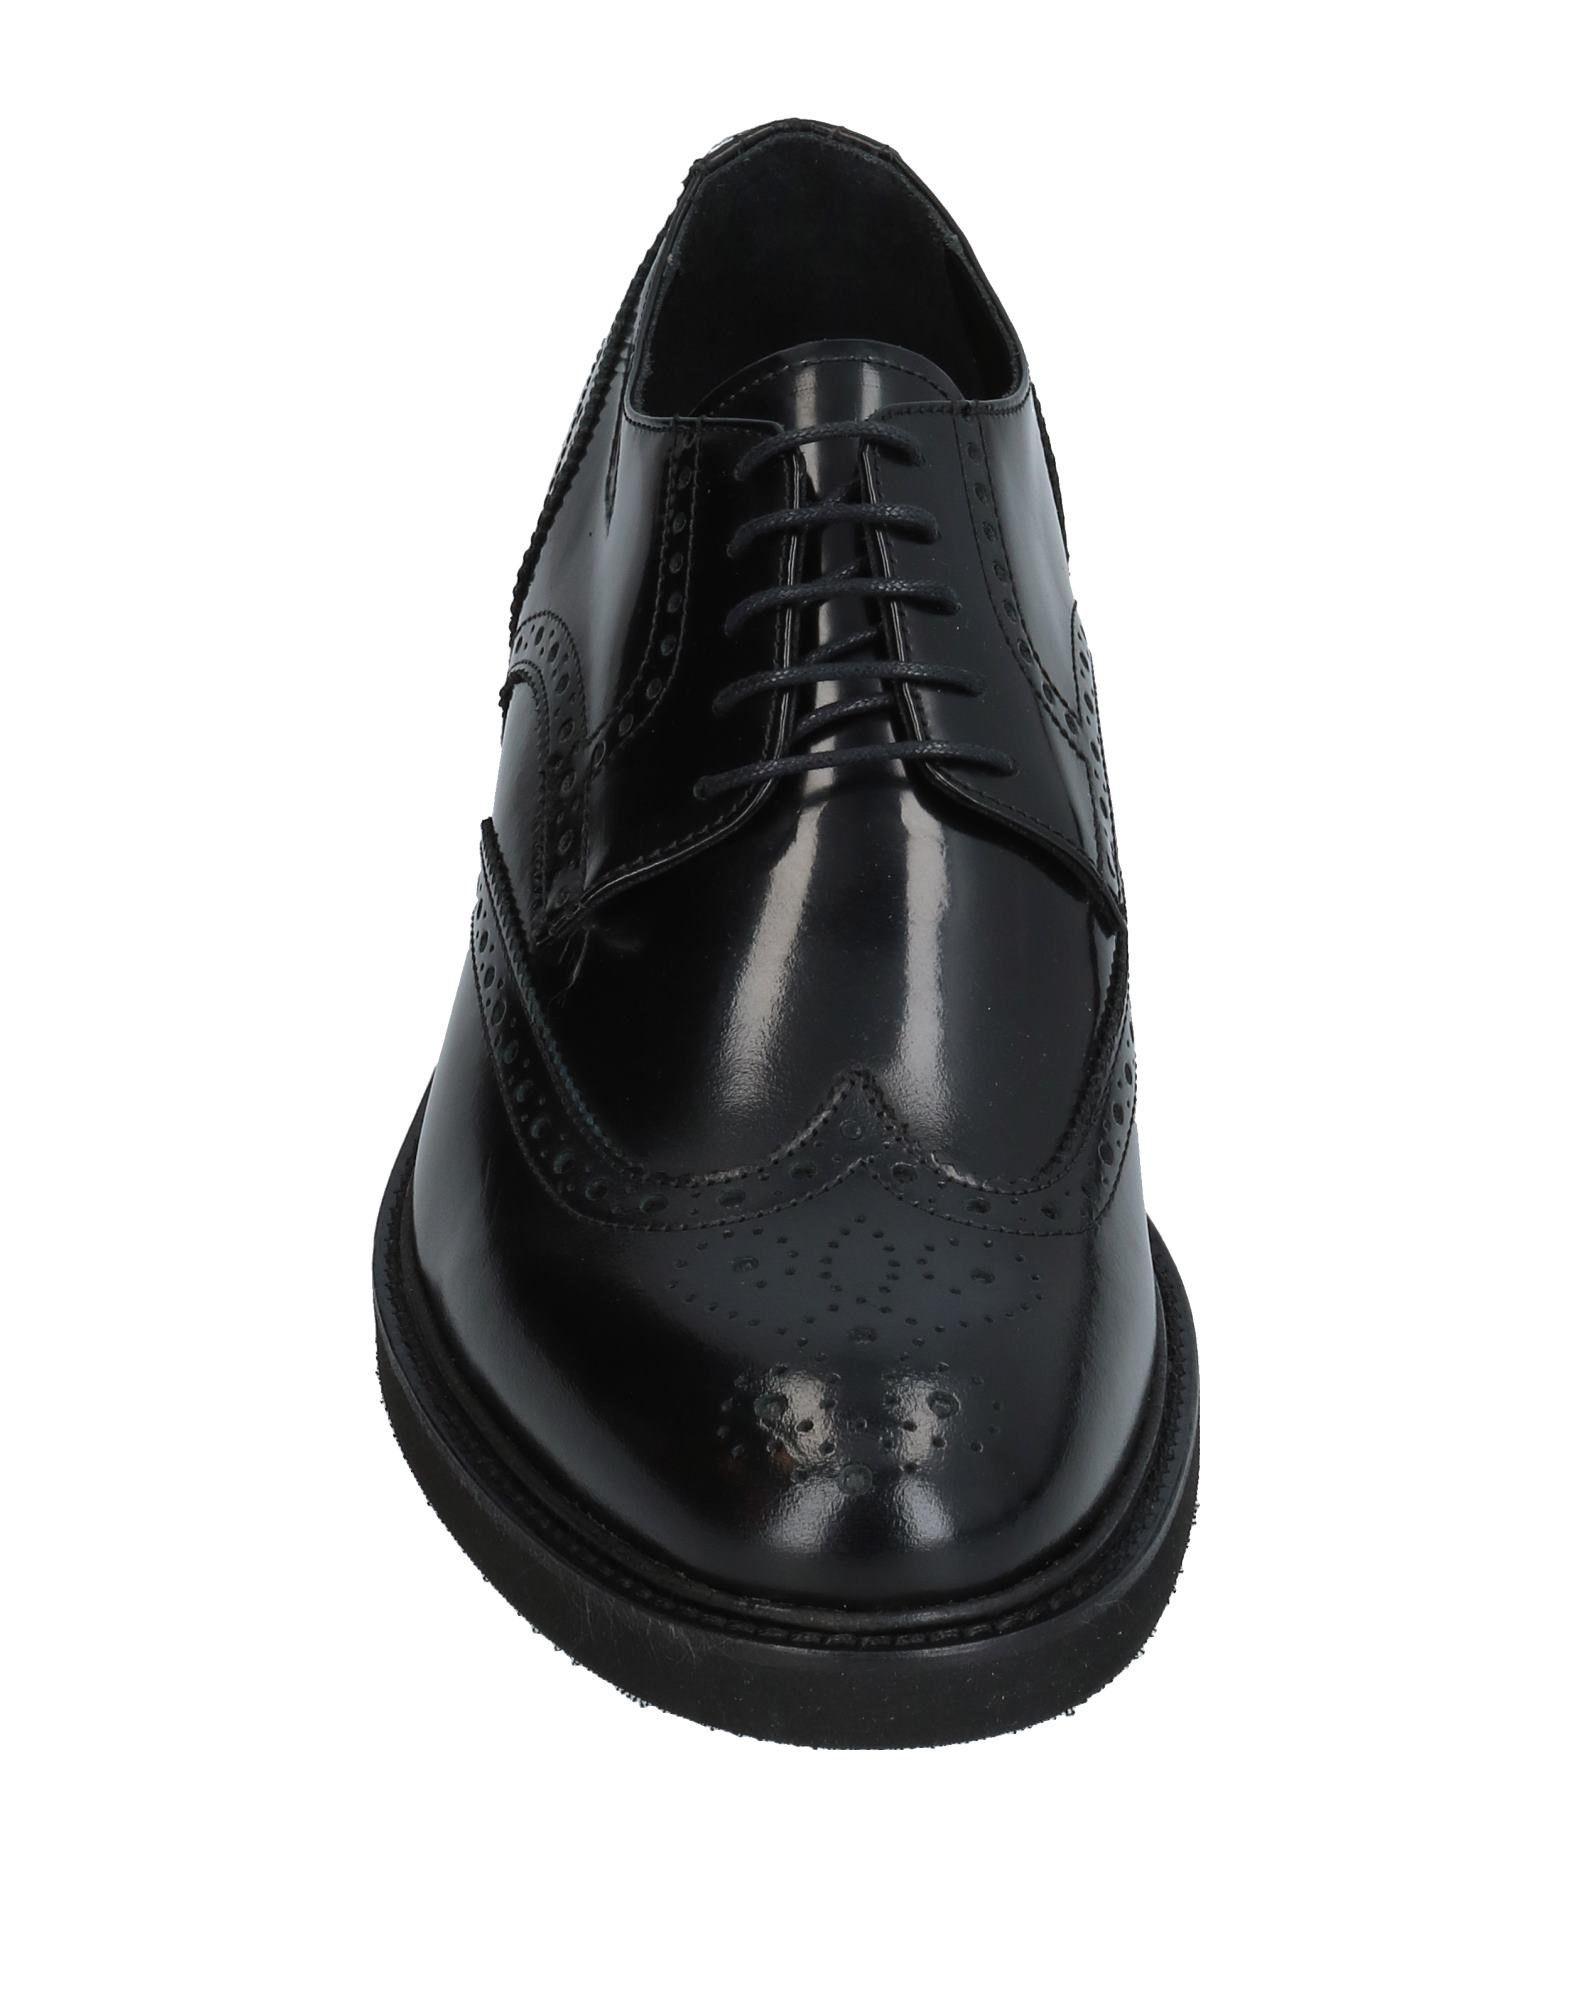 Chaussures - Chaussures À Lacets Calzoleria Napoletana 1921 y82Dk